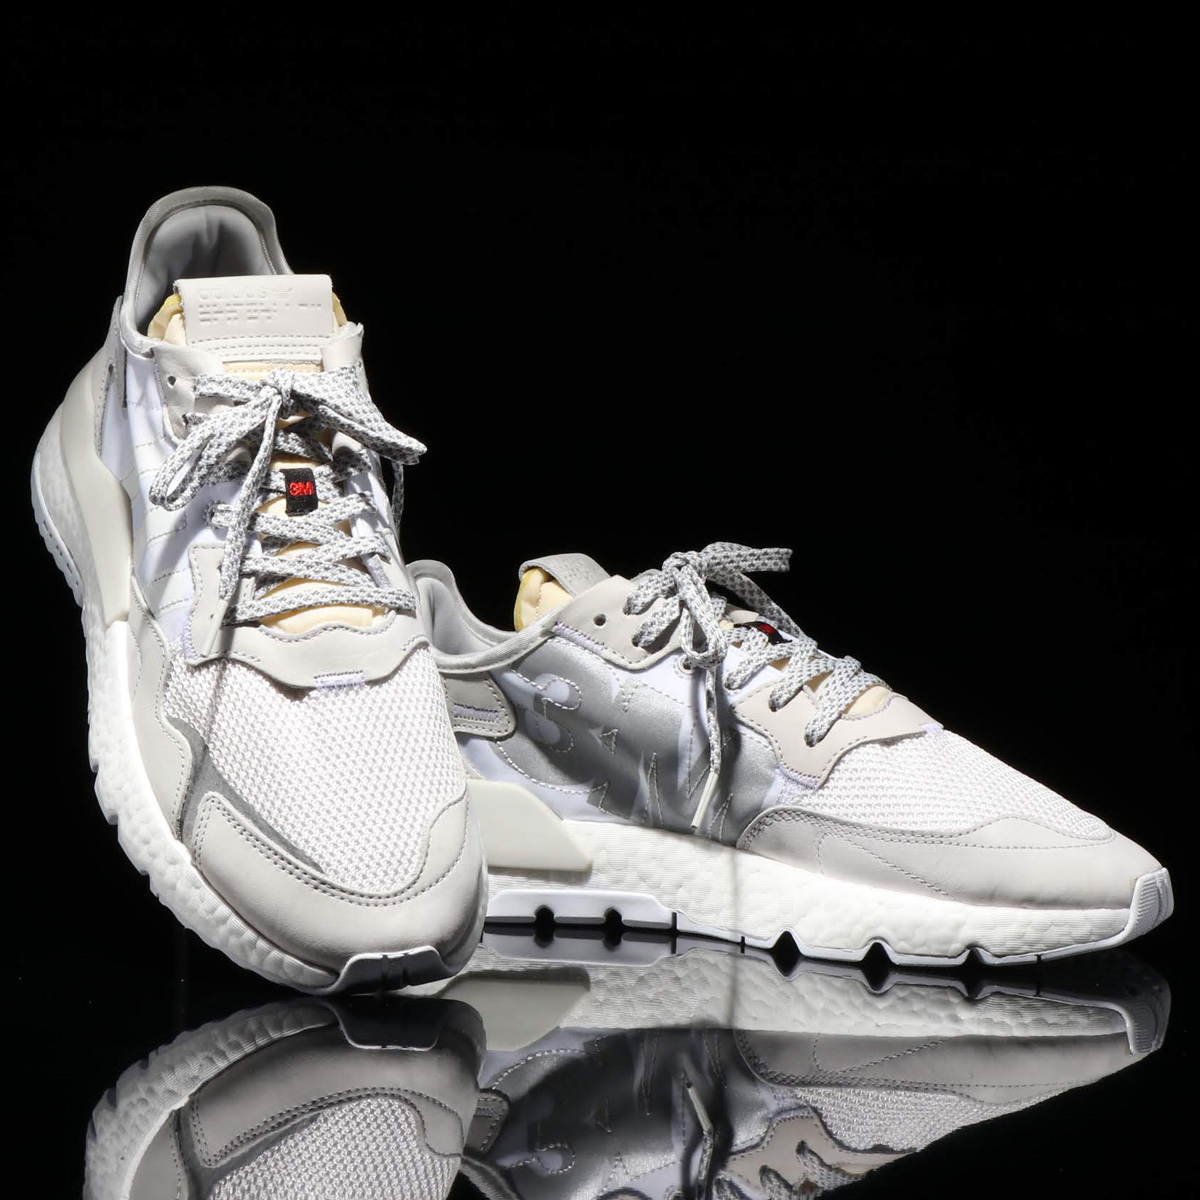 adidas Originals NITE JOGGER(アディダスオリジナルス ナイトジョガー)CRYSTAL WHITE/CRYSTAL WHITE/RUNNING WHITE【メンズ レディース スニーカー】19FW-S